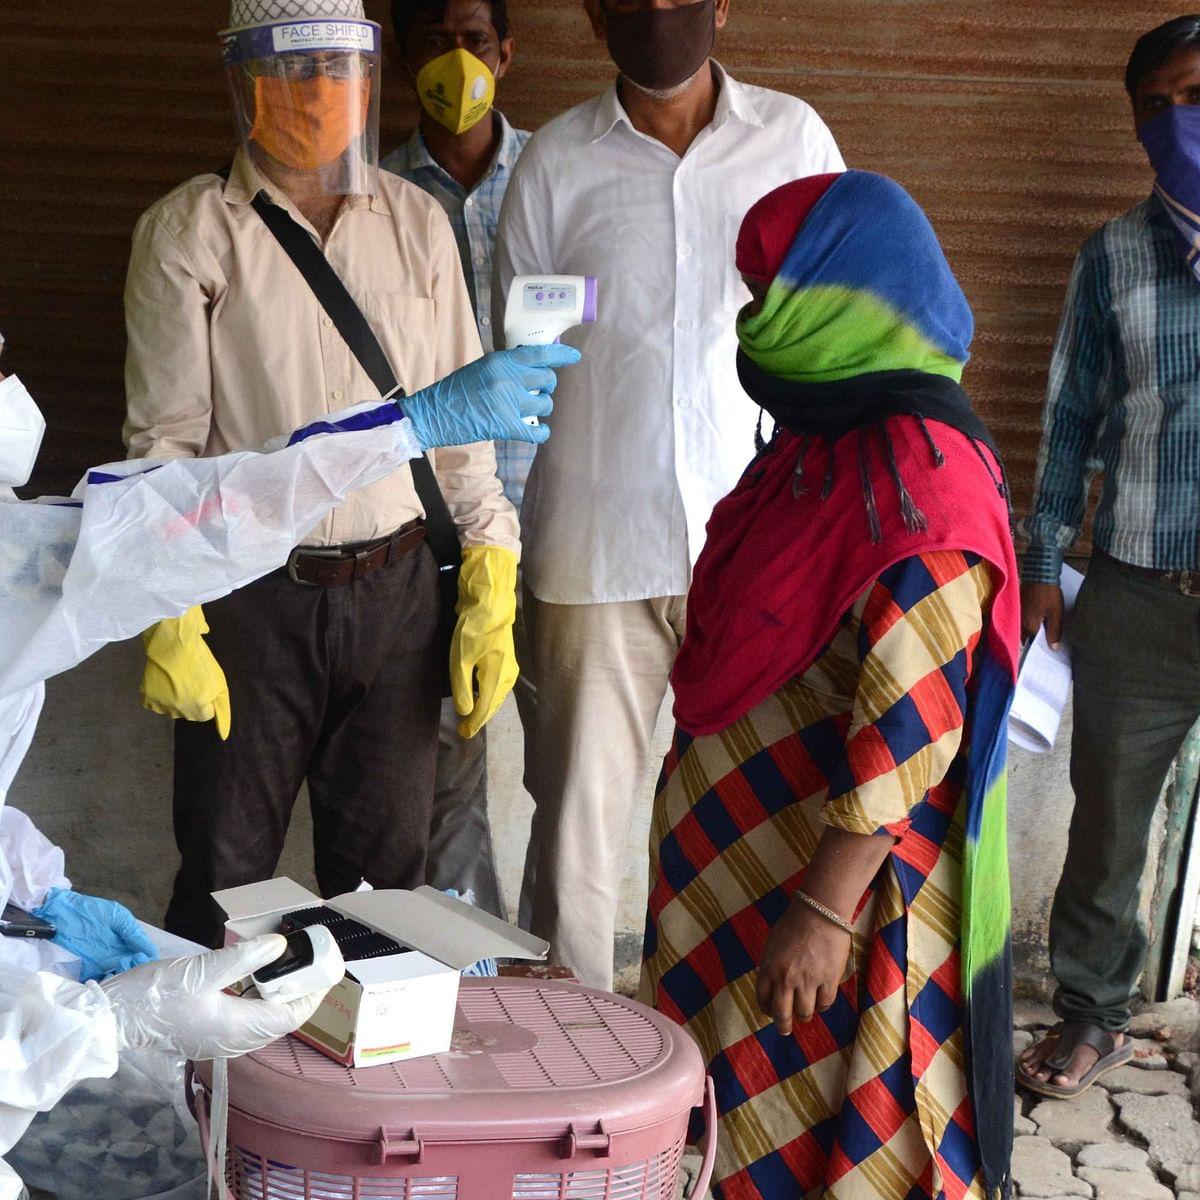 Coronavirus in Bhopal: City records 153 new COVID-19 cases, tally rises to 4,822